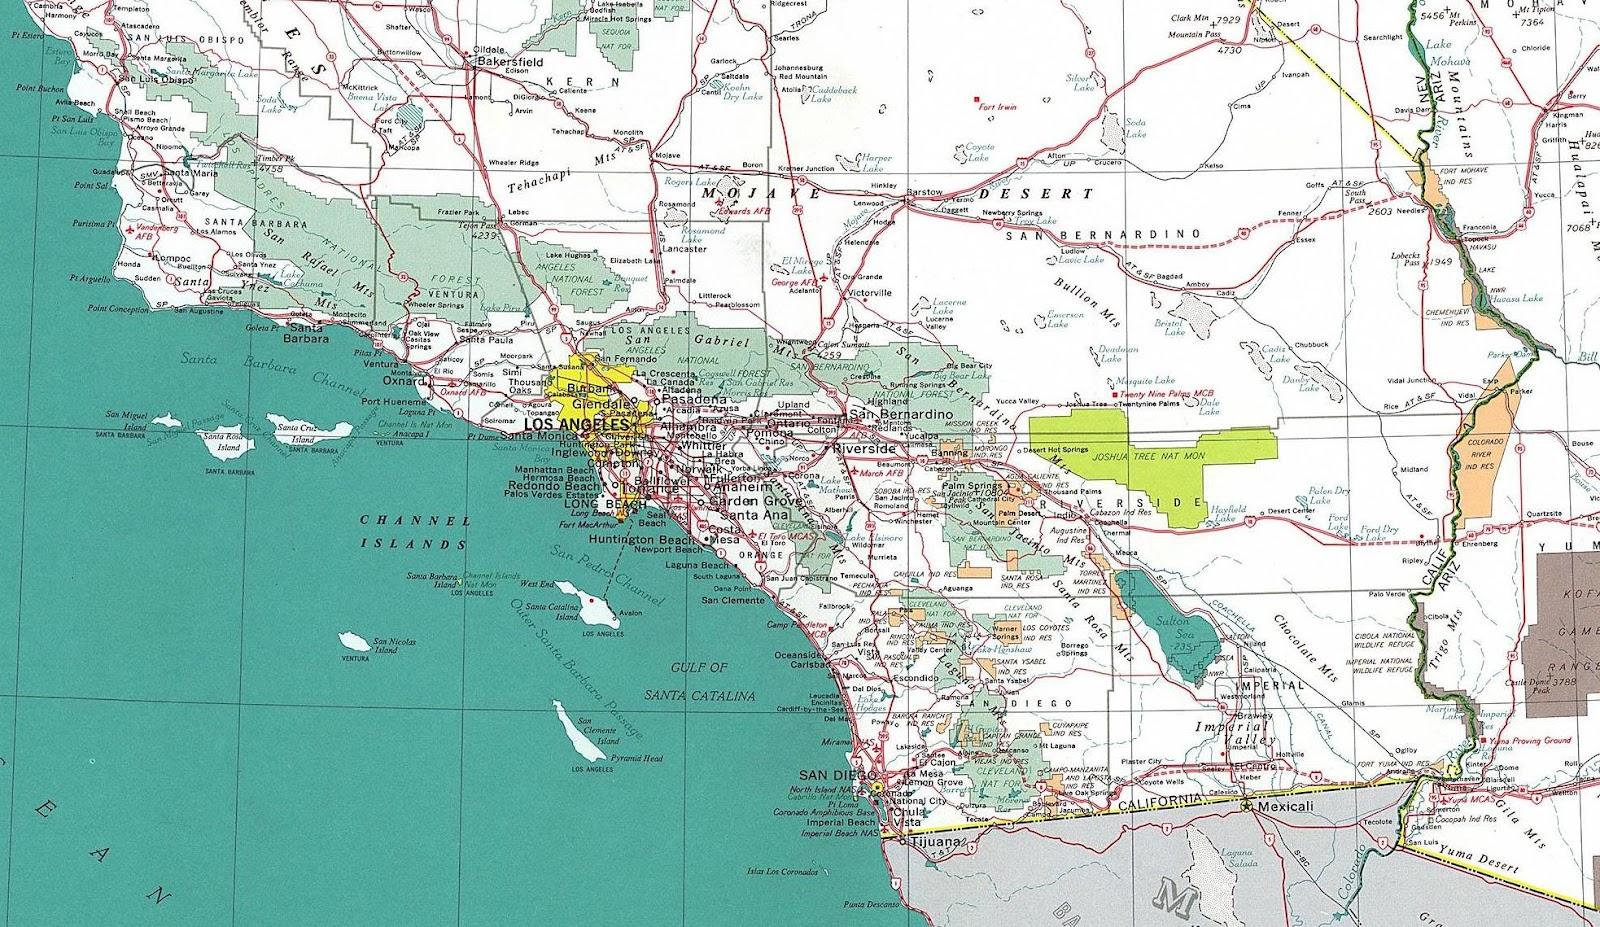 Southern California Road Map California River Map Highway Map - Road Map Of Southern California